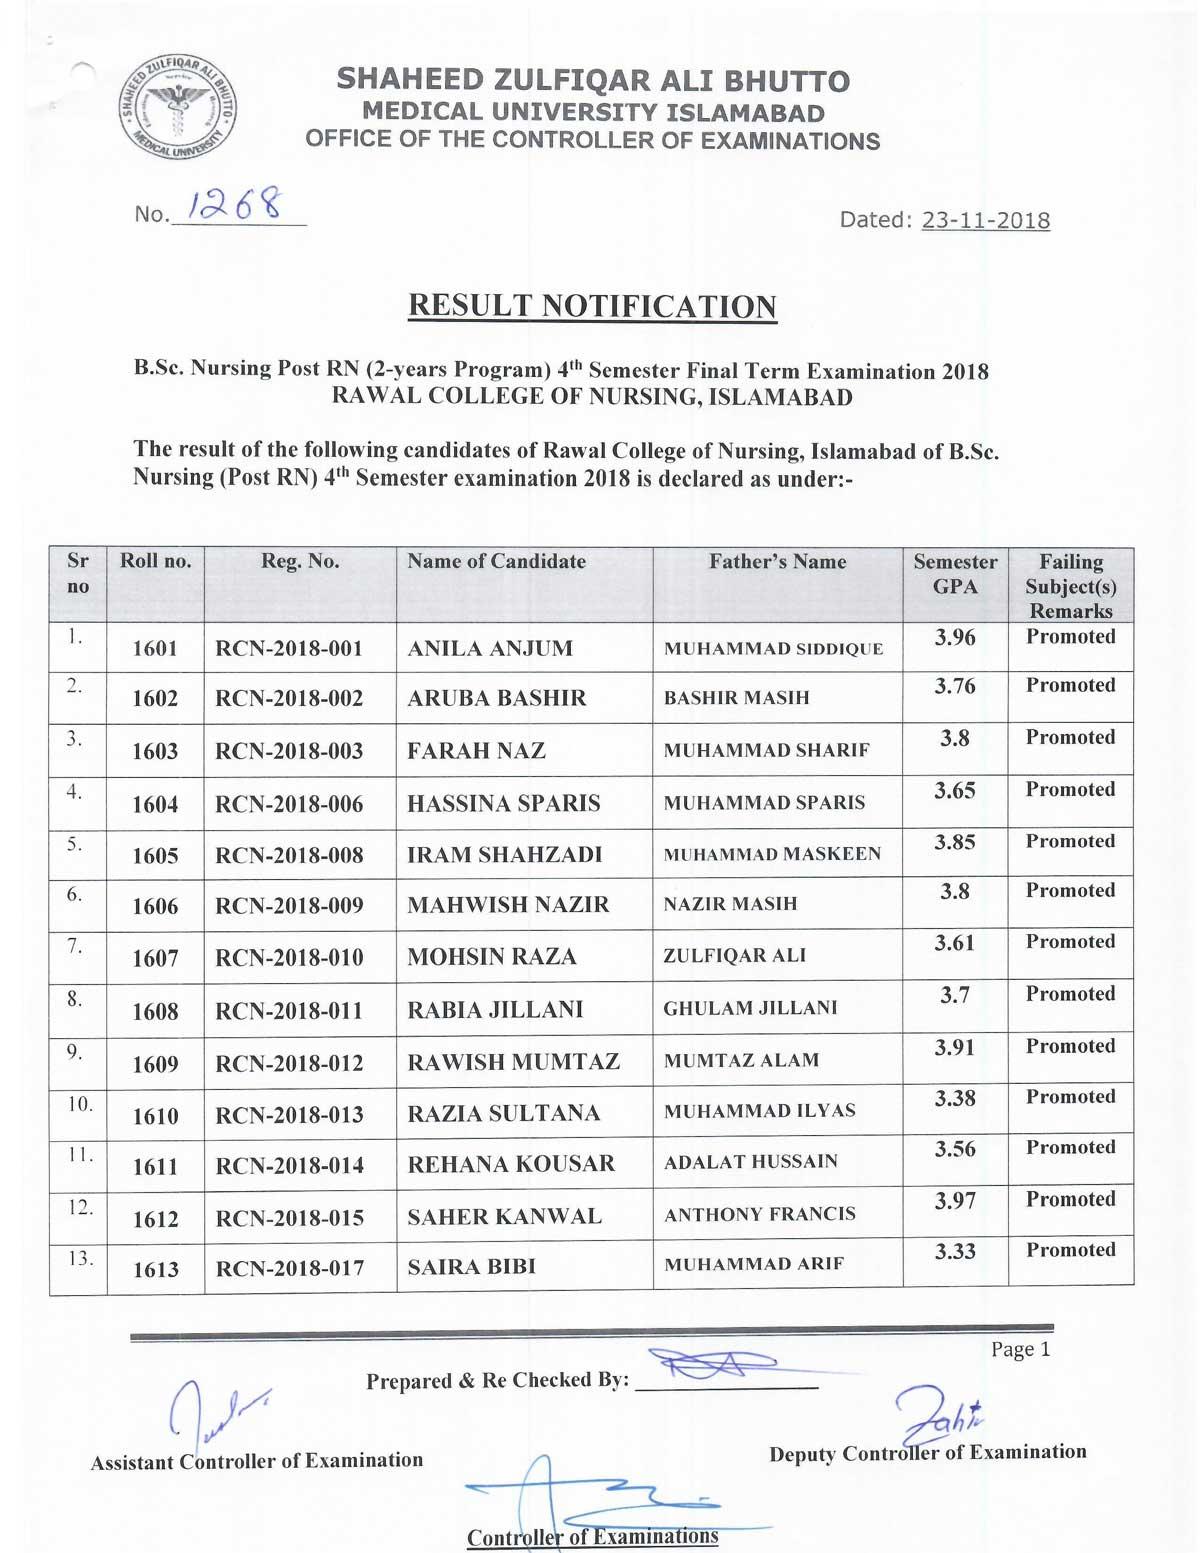 Result Notification - B.sc Nursing 2nd Year 4th Semester, Rawal College of Nursing